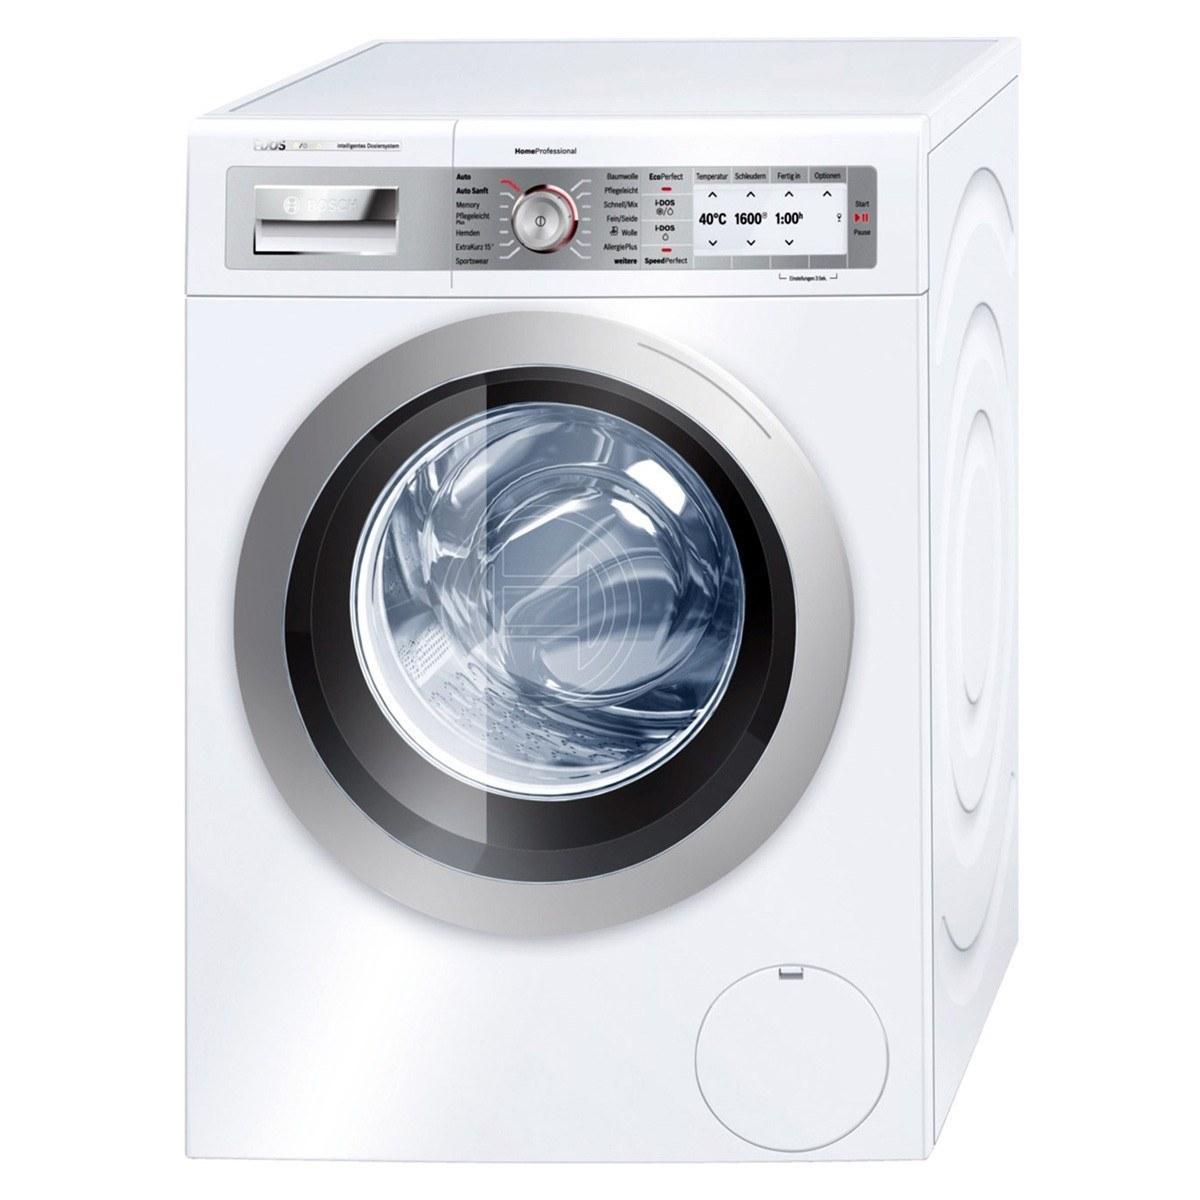 تصویر ماشین لباسشویی بوش مدل WAY32841IR ظرفیت 9 کیلوگرم ا Bosch WAY32841IR Washing Machine 9Kg Bosch WAY32841IR Washing Machine 9Kg